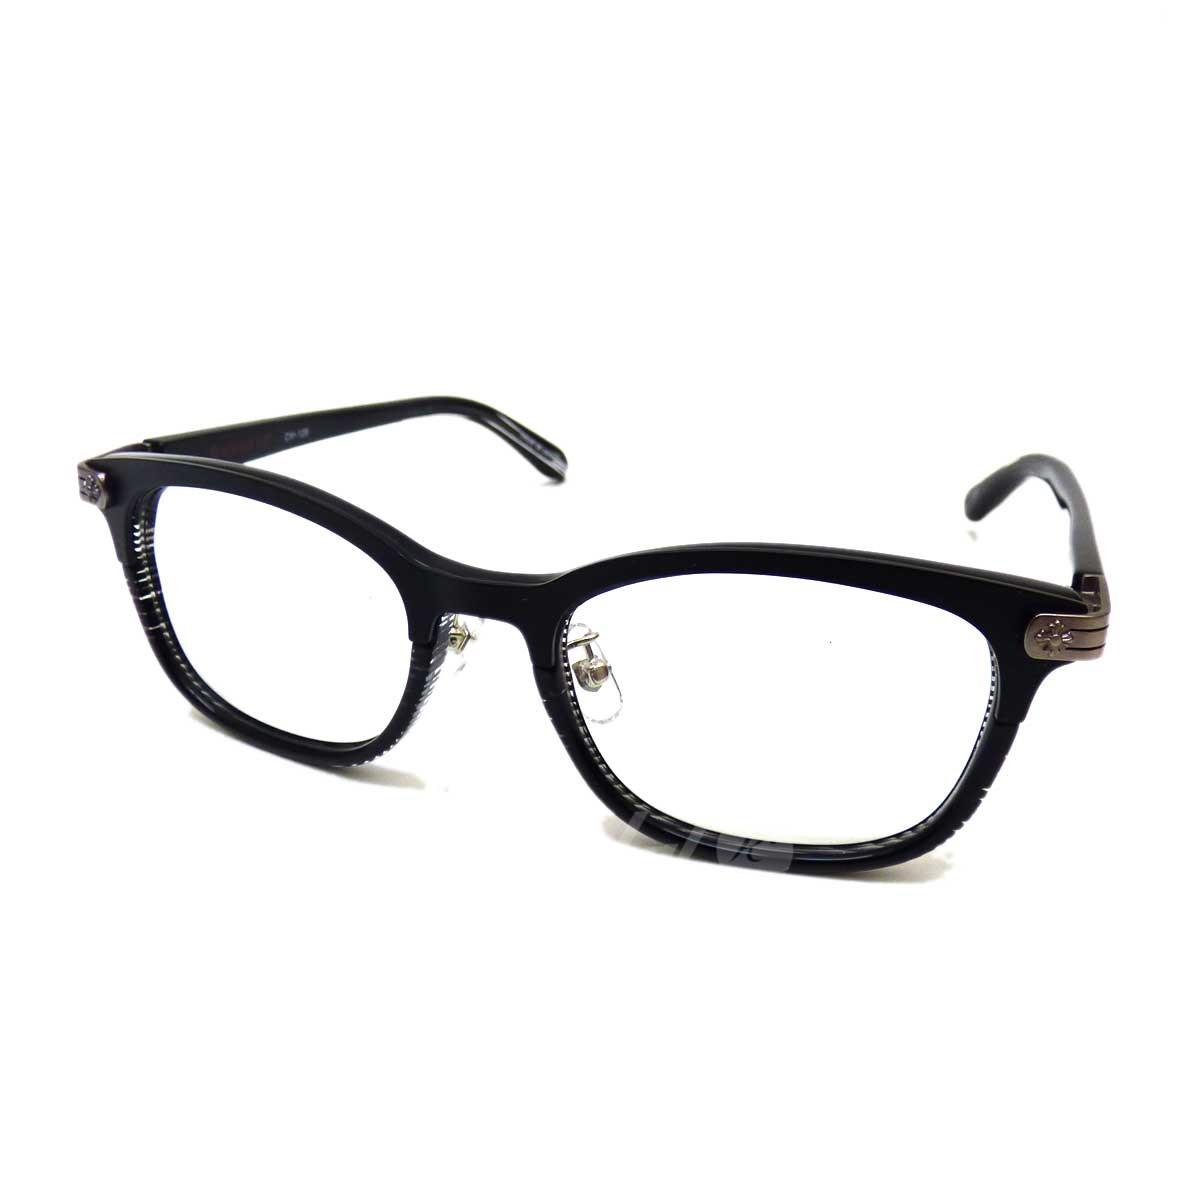 【中古】CHRONIC CH-128 眼鏡 【055258】 【KIND1327】